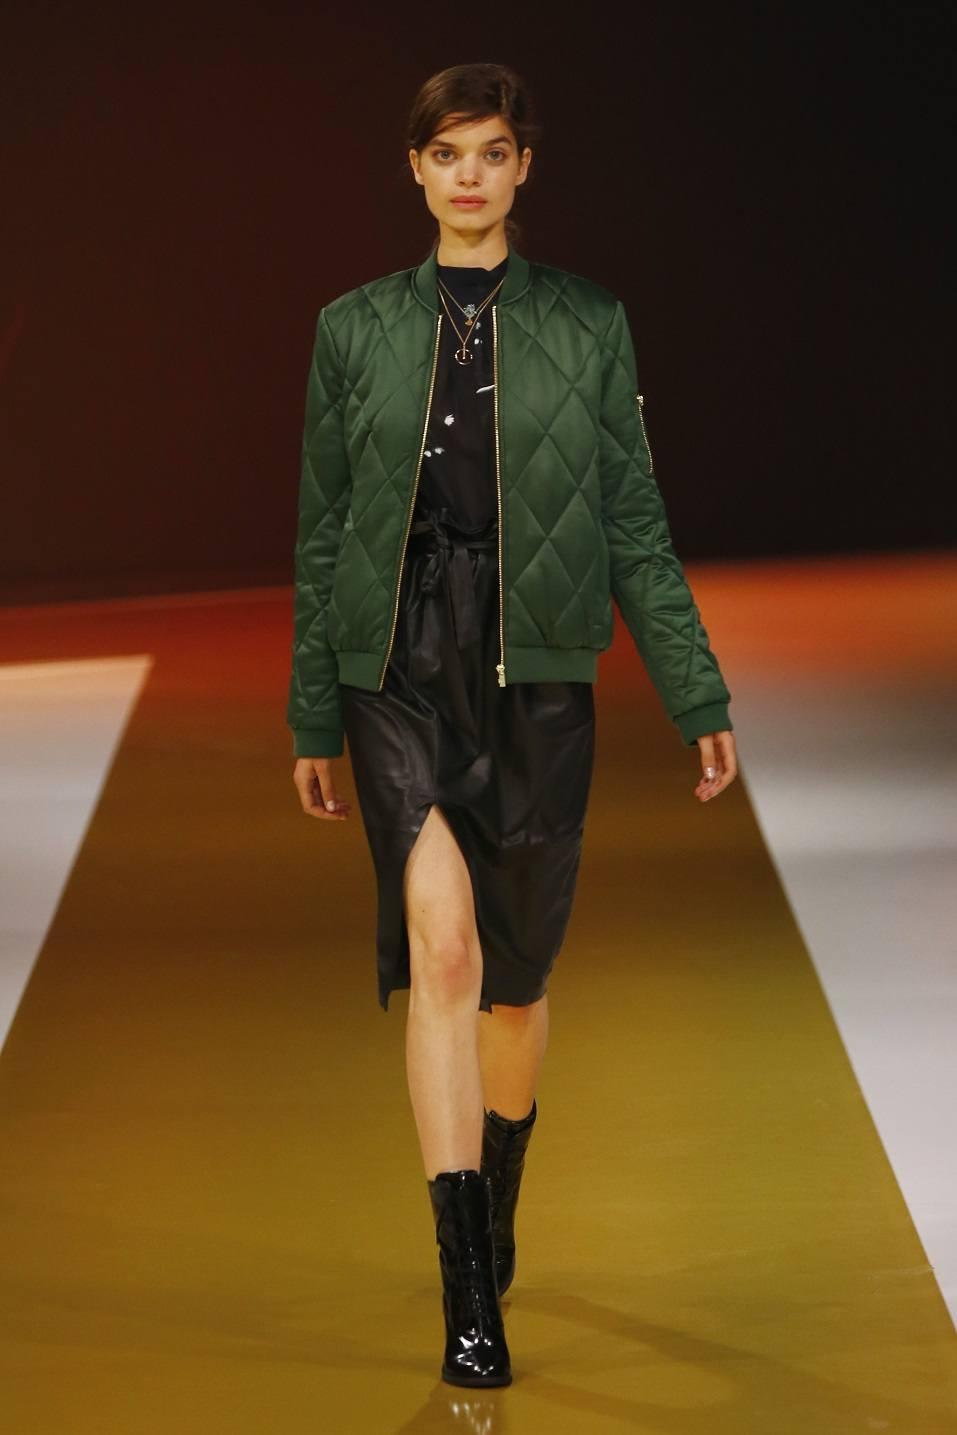 A model walks the runway at the Zalando fashion show